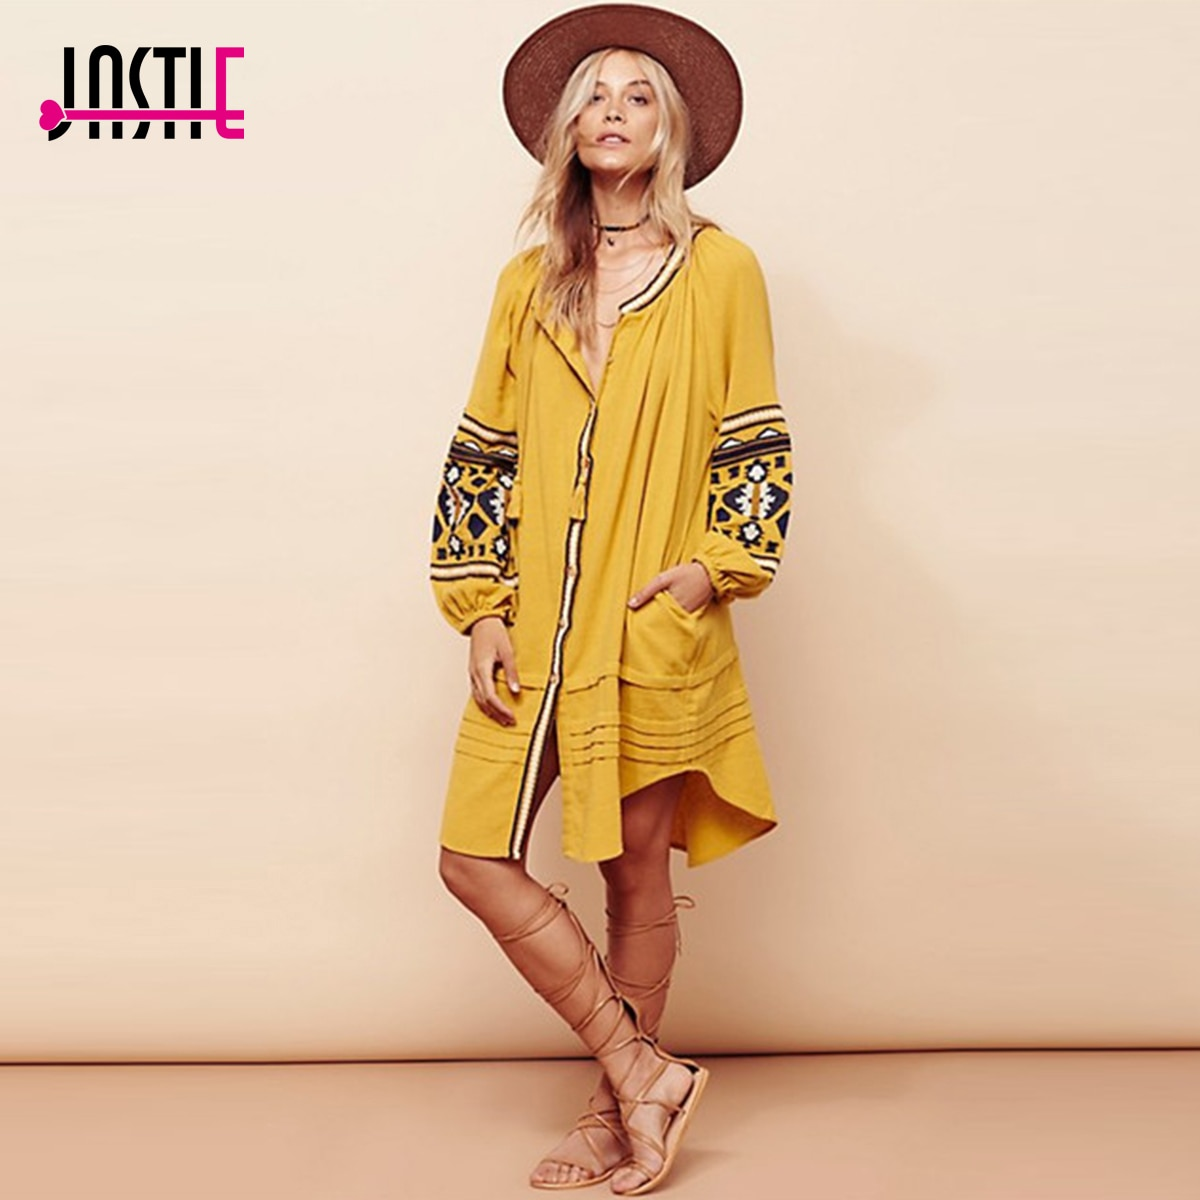 Jastie فستان بوهو مطرز عتيق فساتين نسائية كبيرة الحجم بأكمام واسعة فستان شاطئ قصير أنيق غير رسمي فيستيدوس